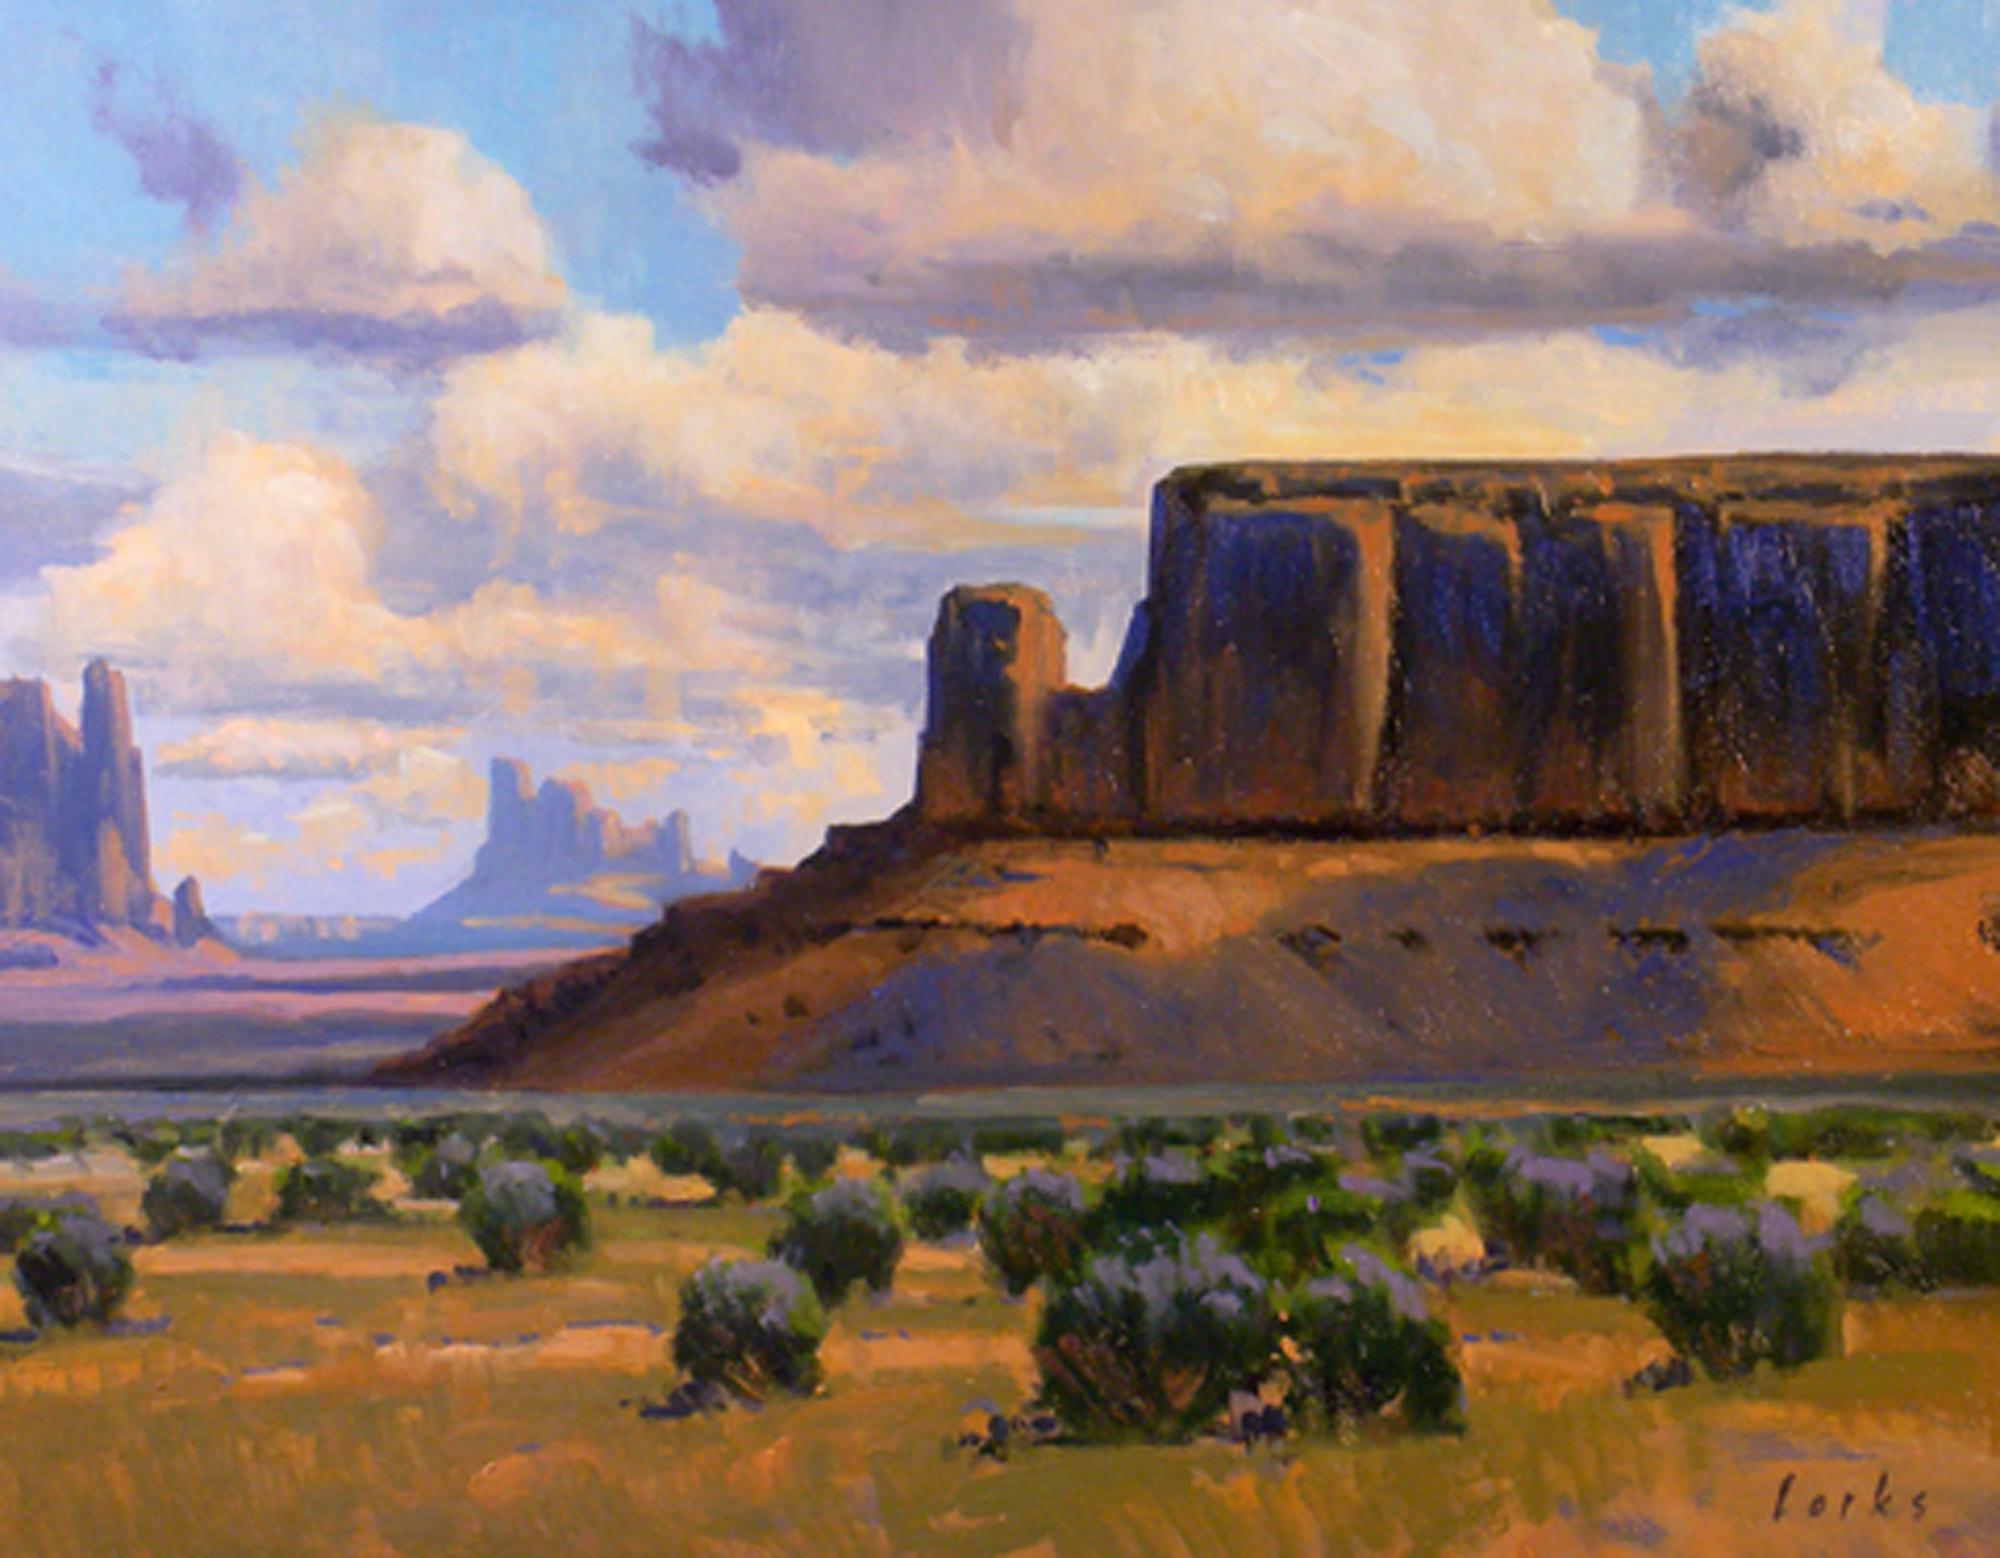 David Forks_Monuments of Time_16x20_Oil.JPG